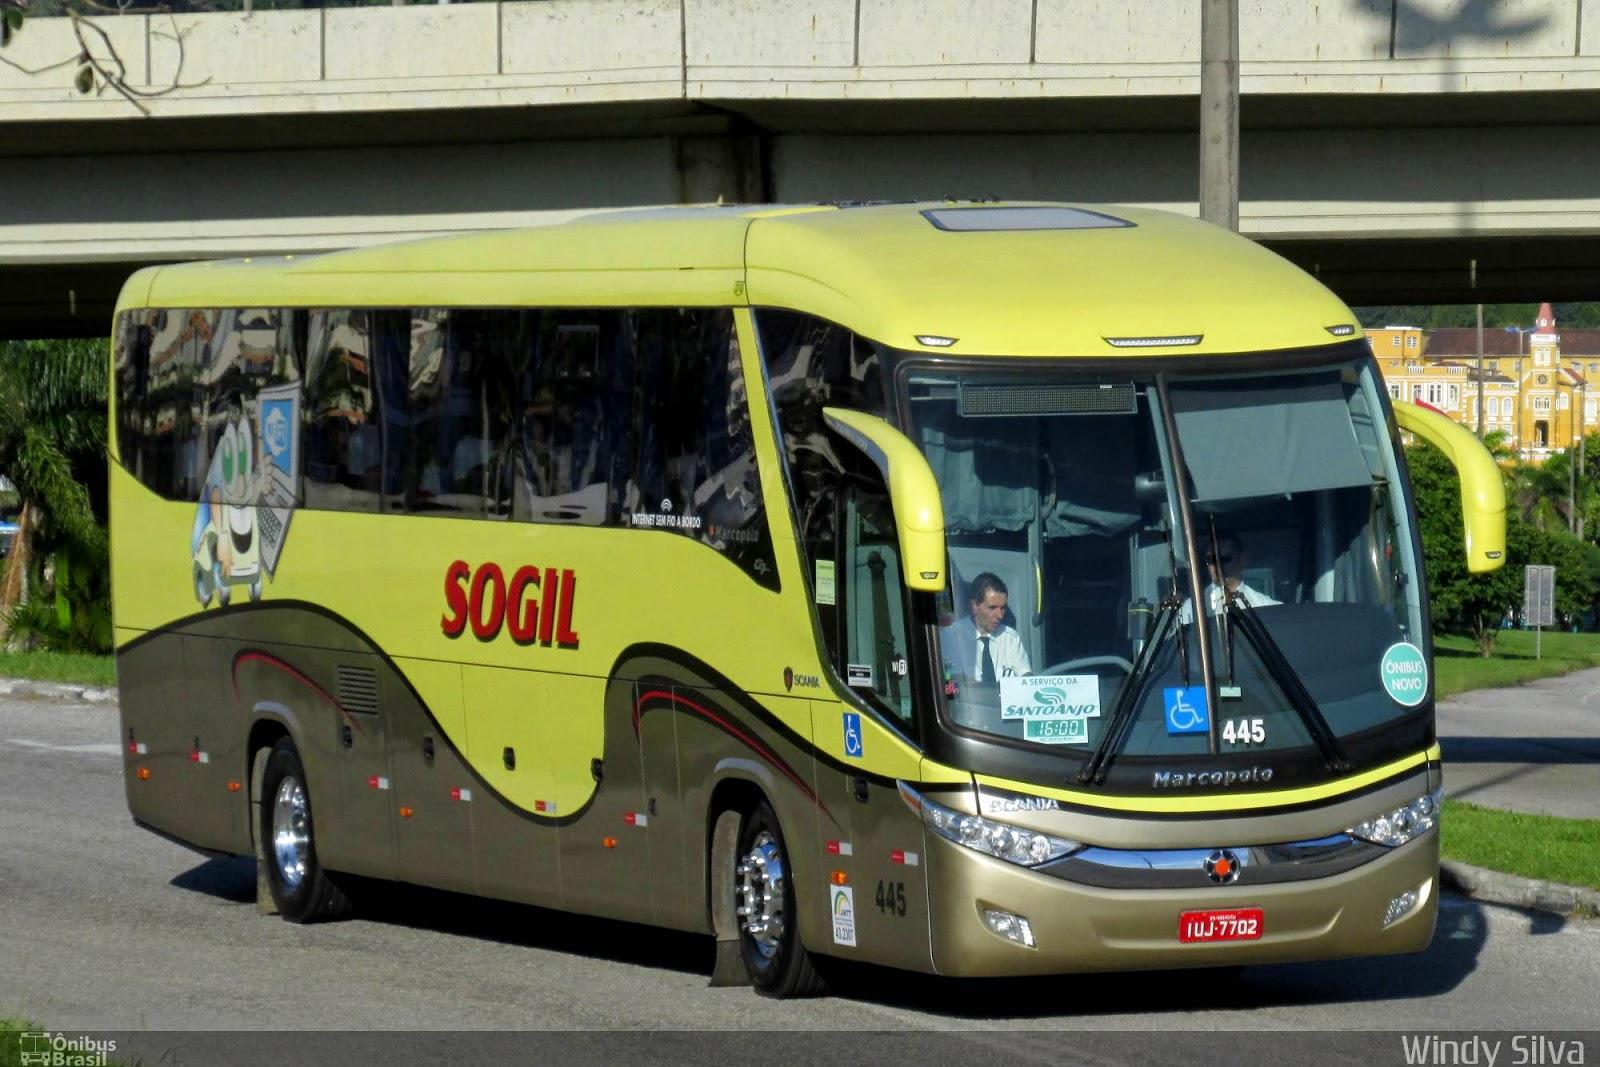 Sogil445-G7paradiso1200-ScaniaK310-Flori